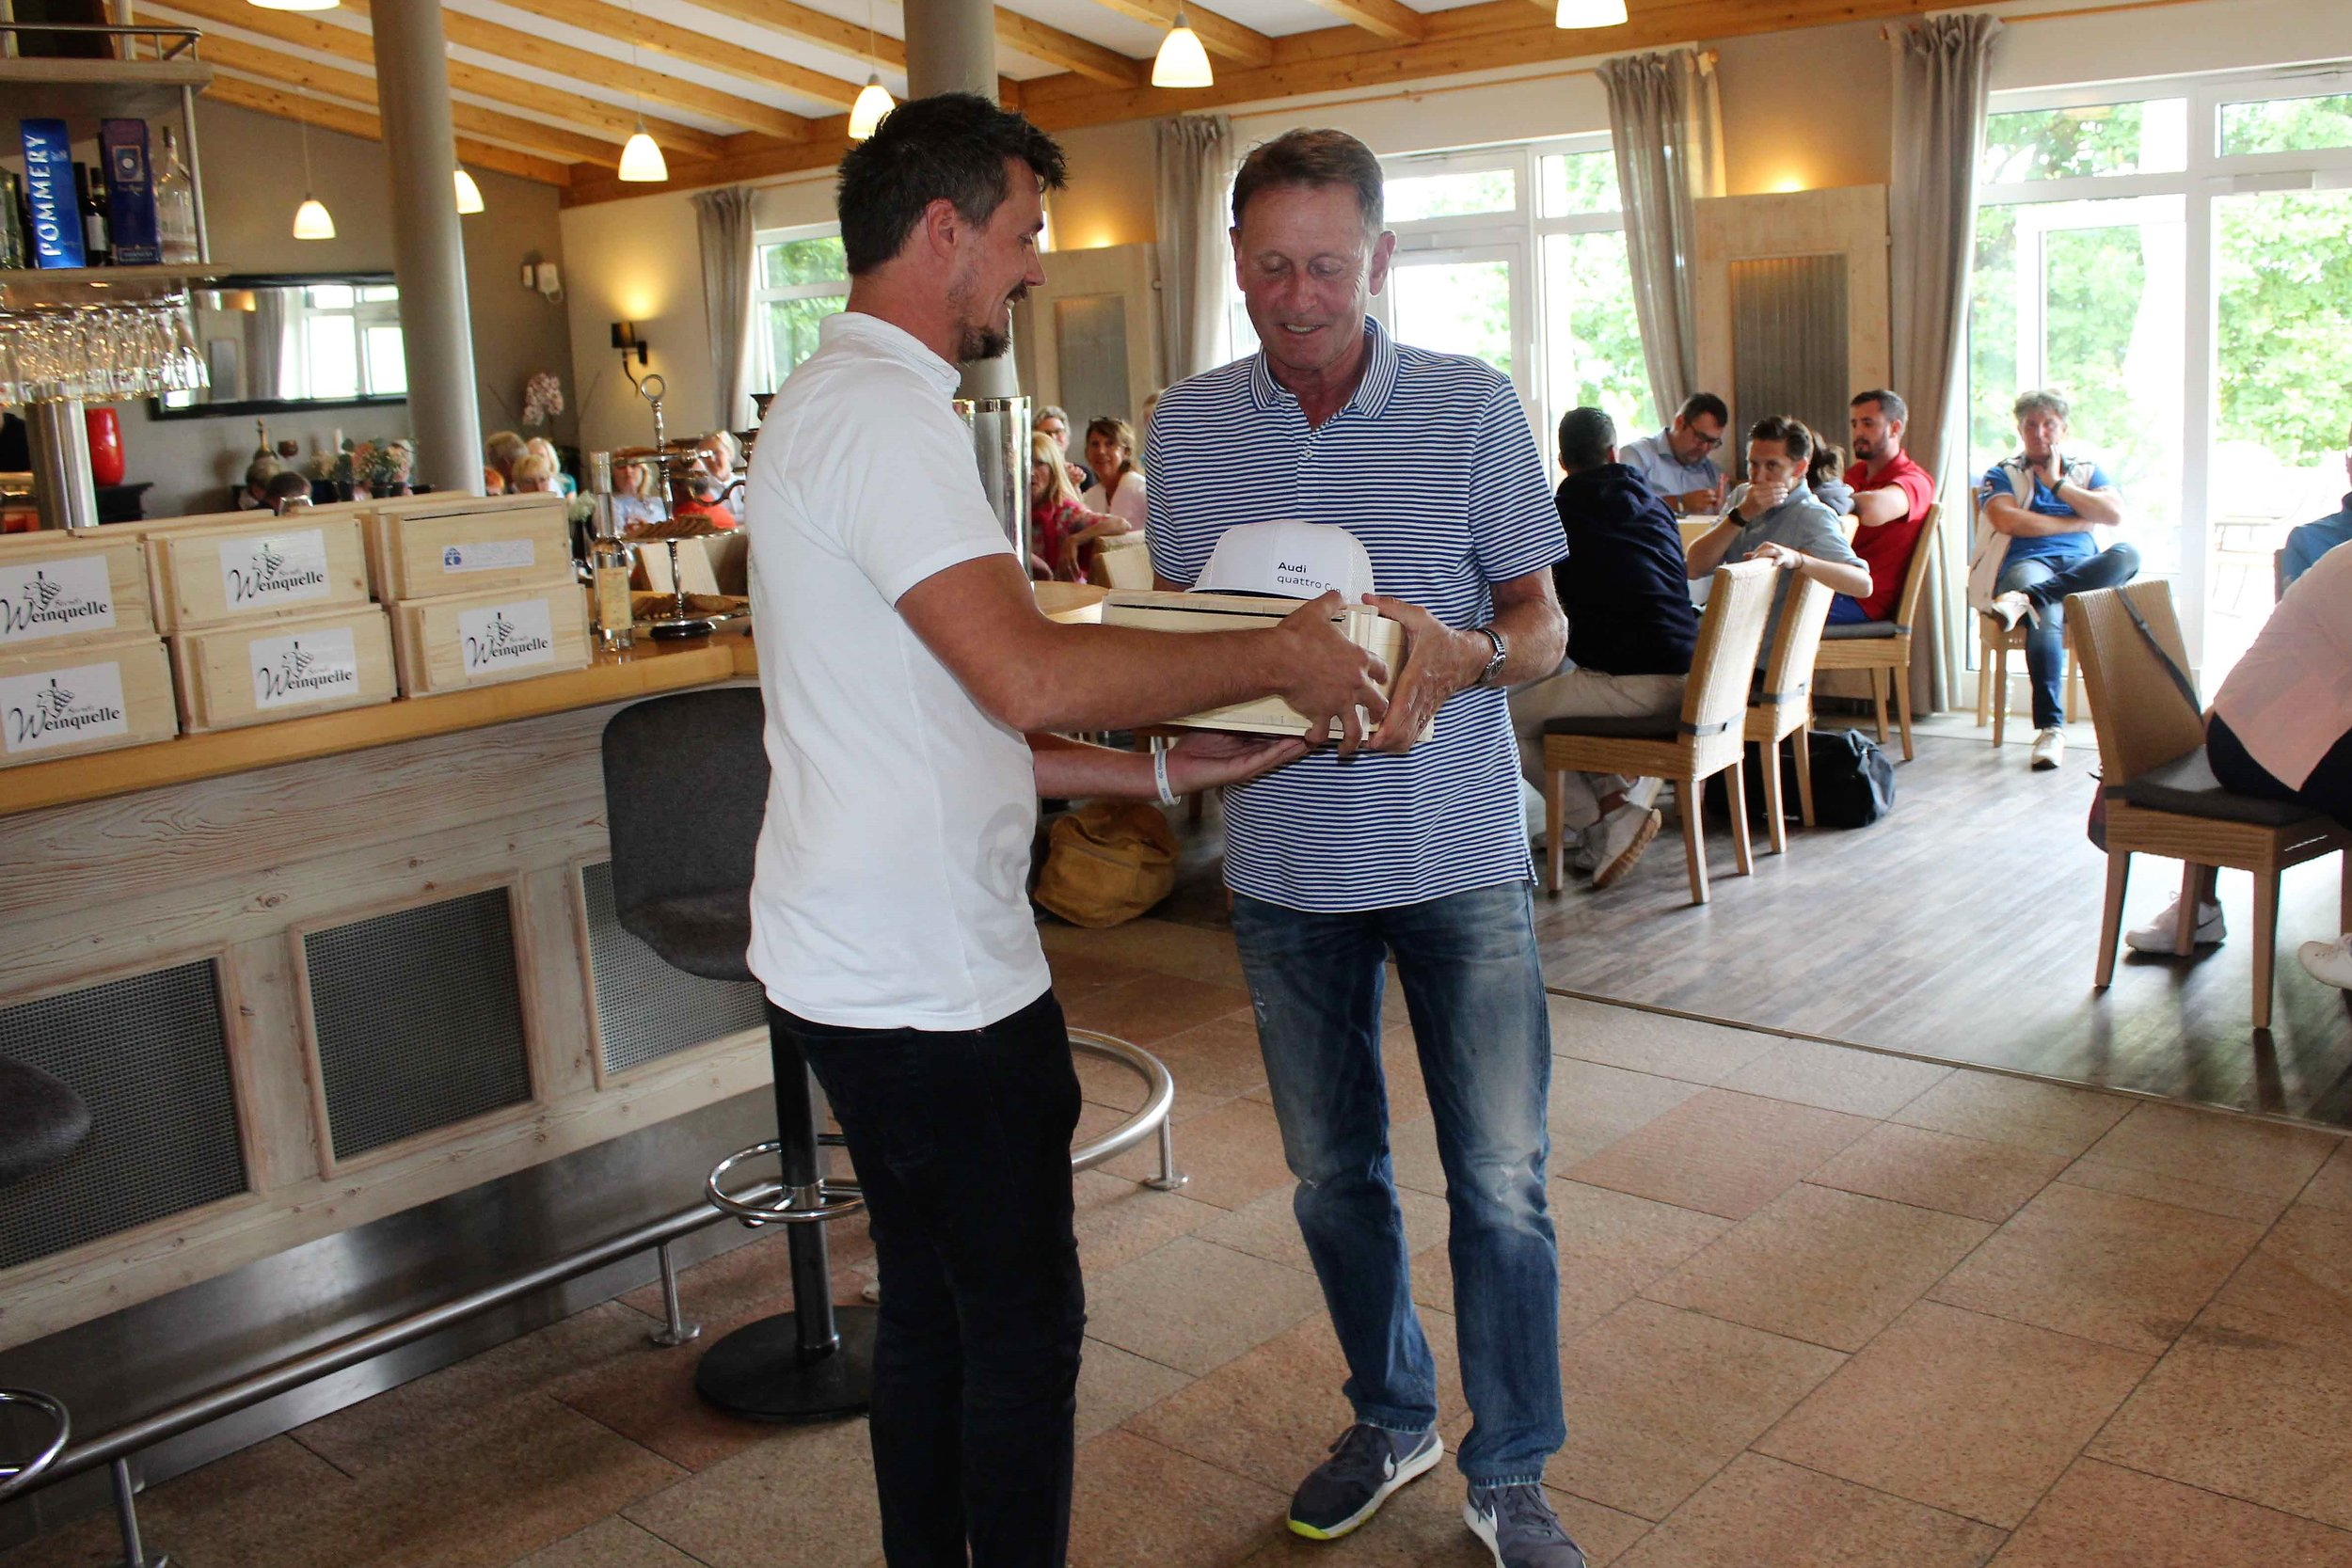 IMG_6119 2019-07-14 Monatsbecher Odenwald.jpg